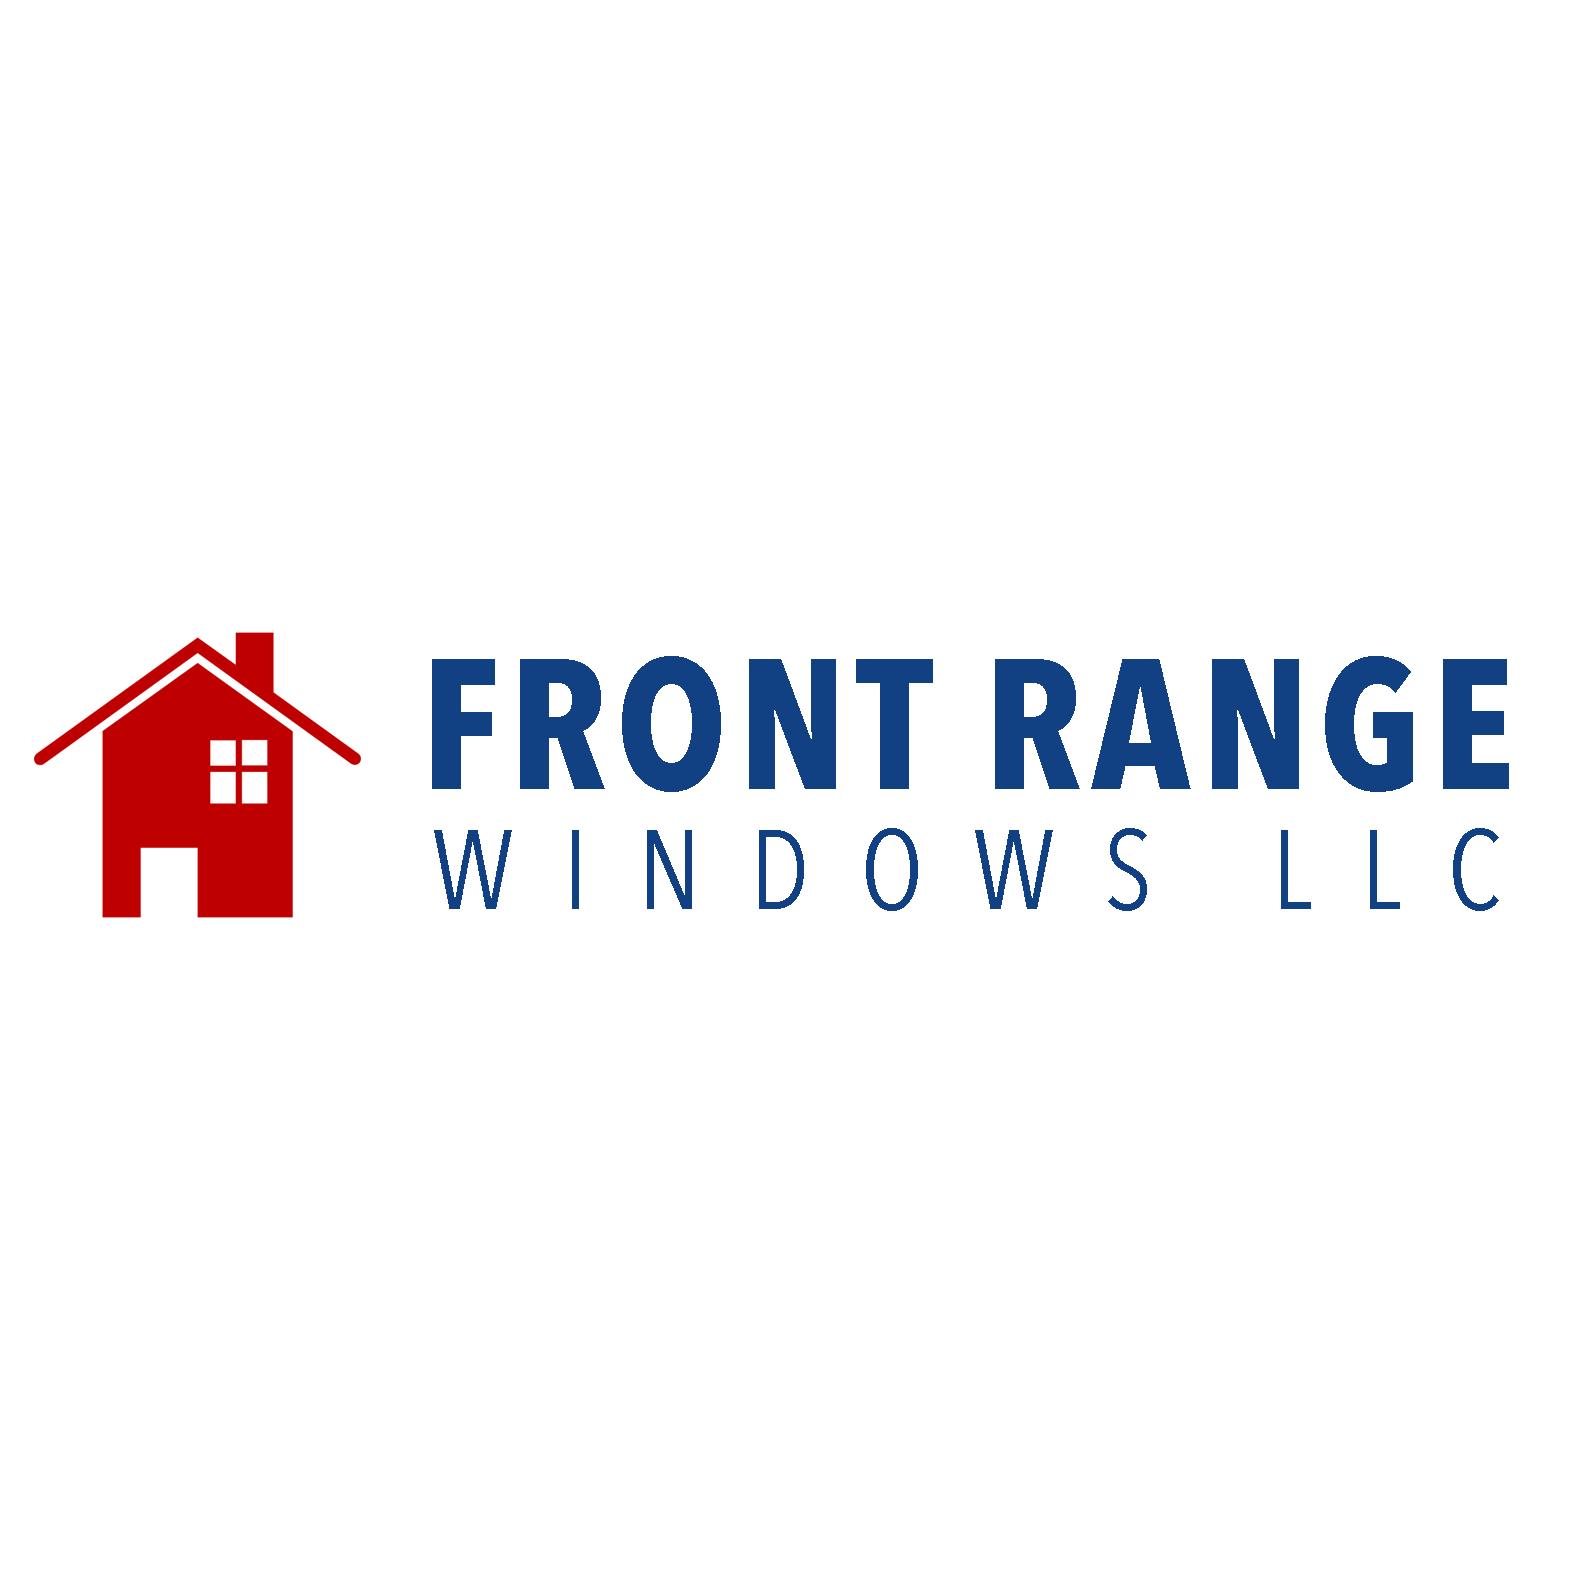 Front Range Windows LLC